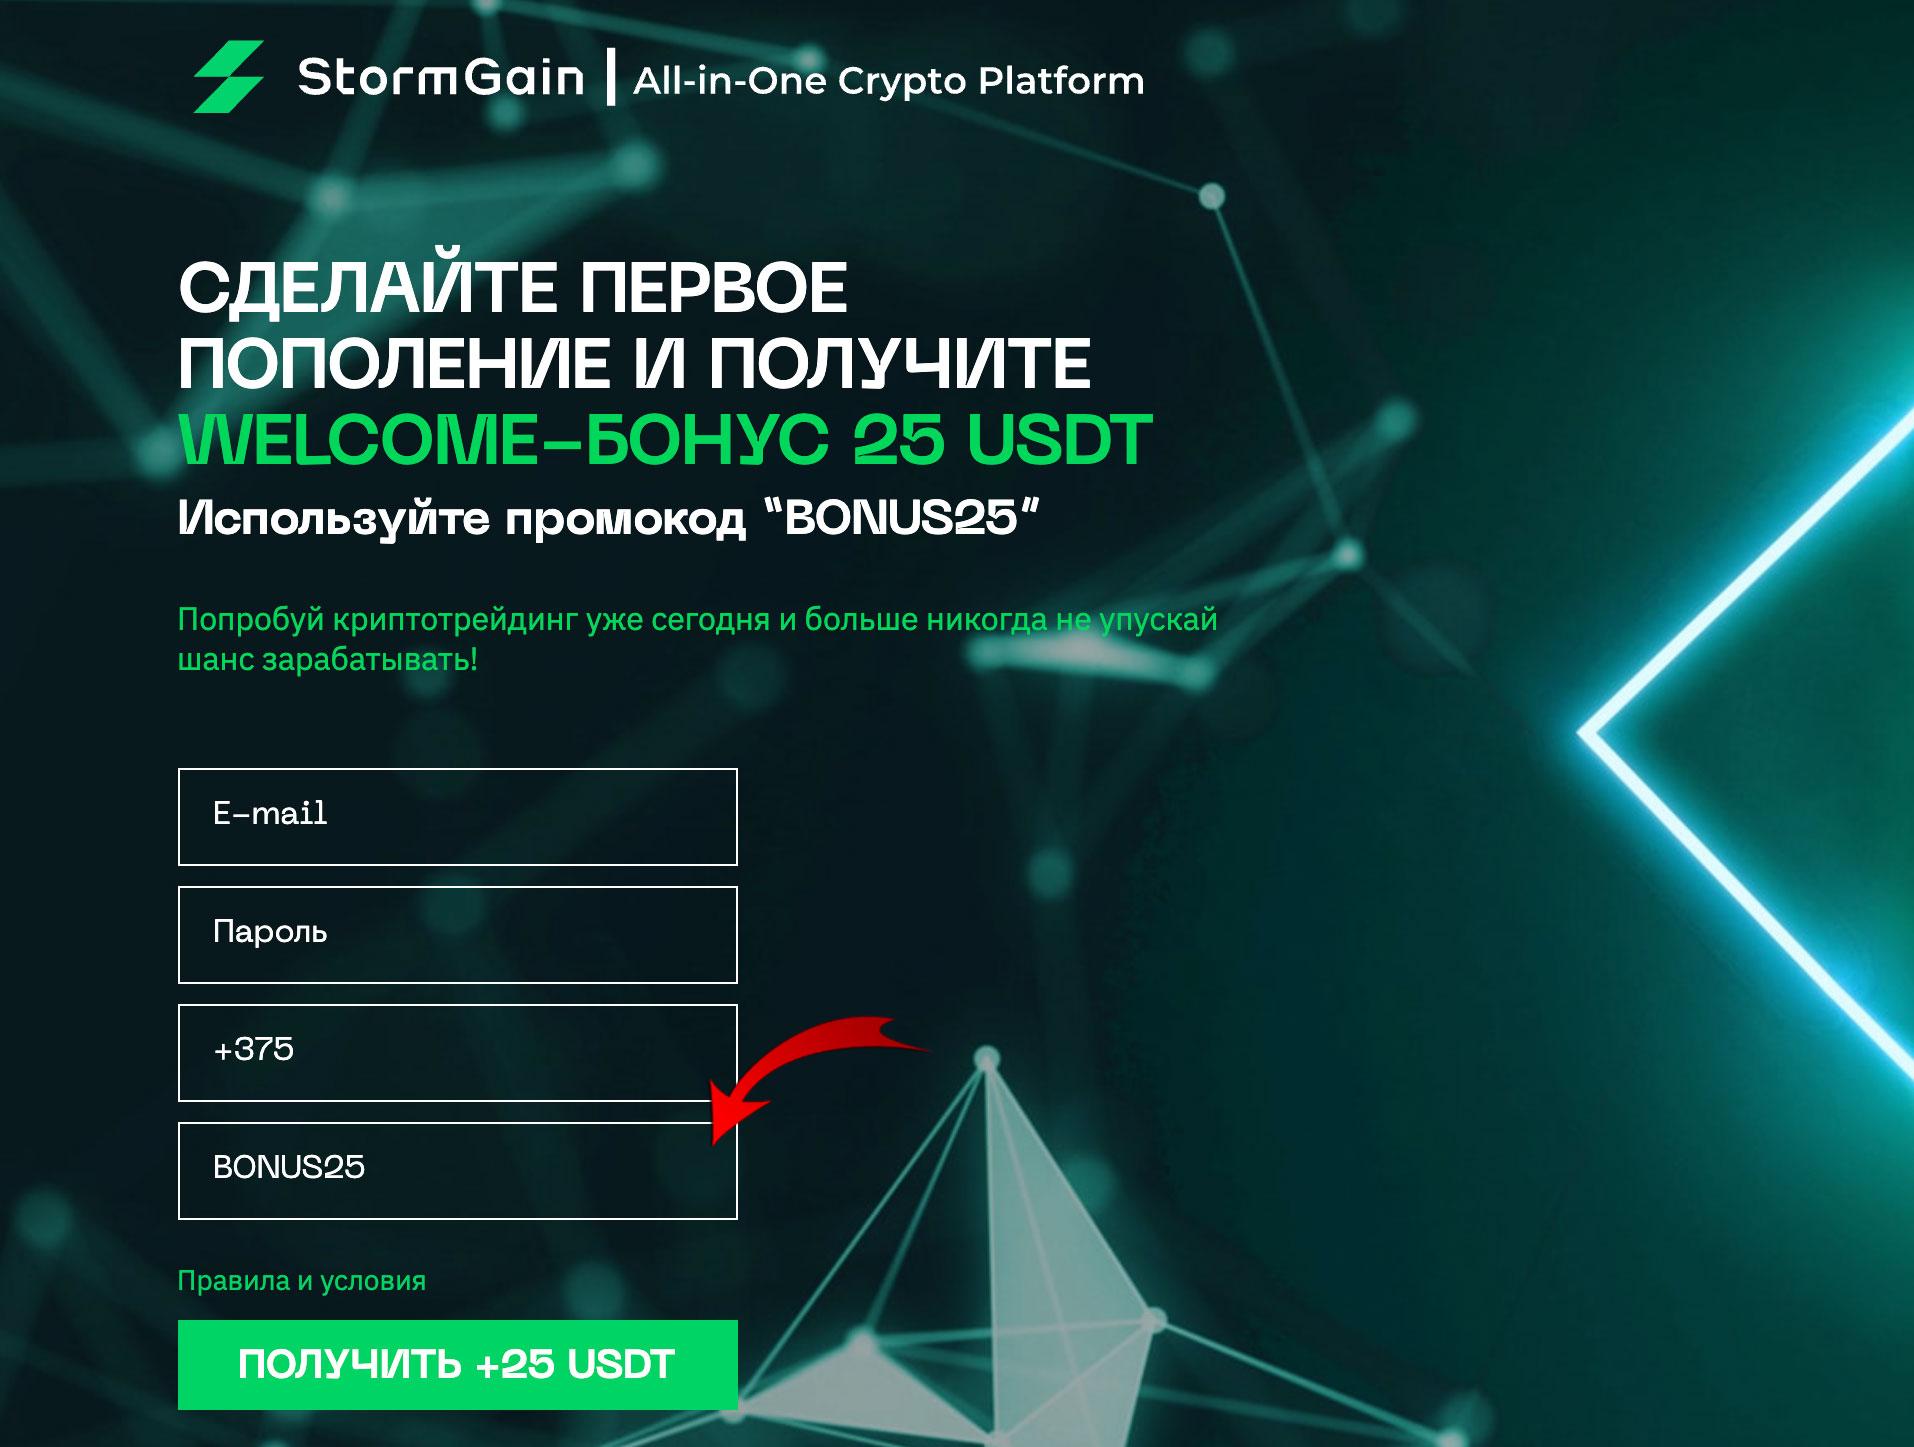 stormgain регистрация аккаунта бонус при регистрации